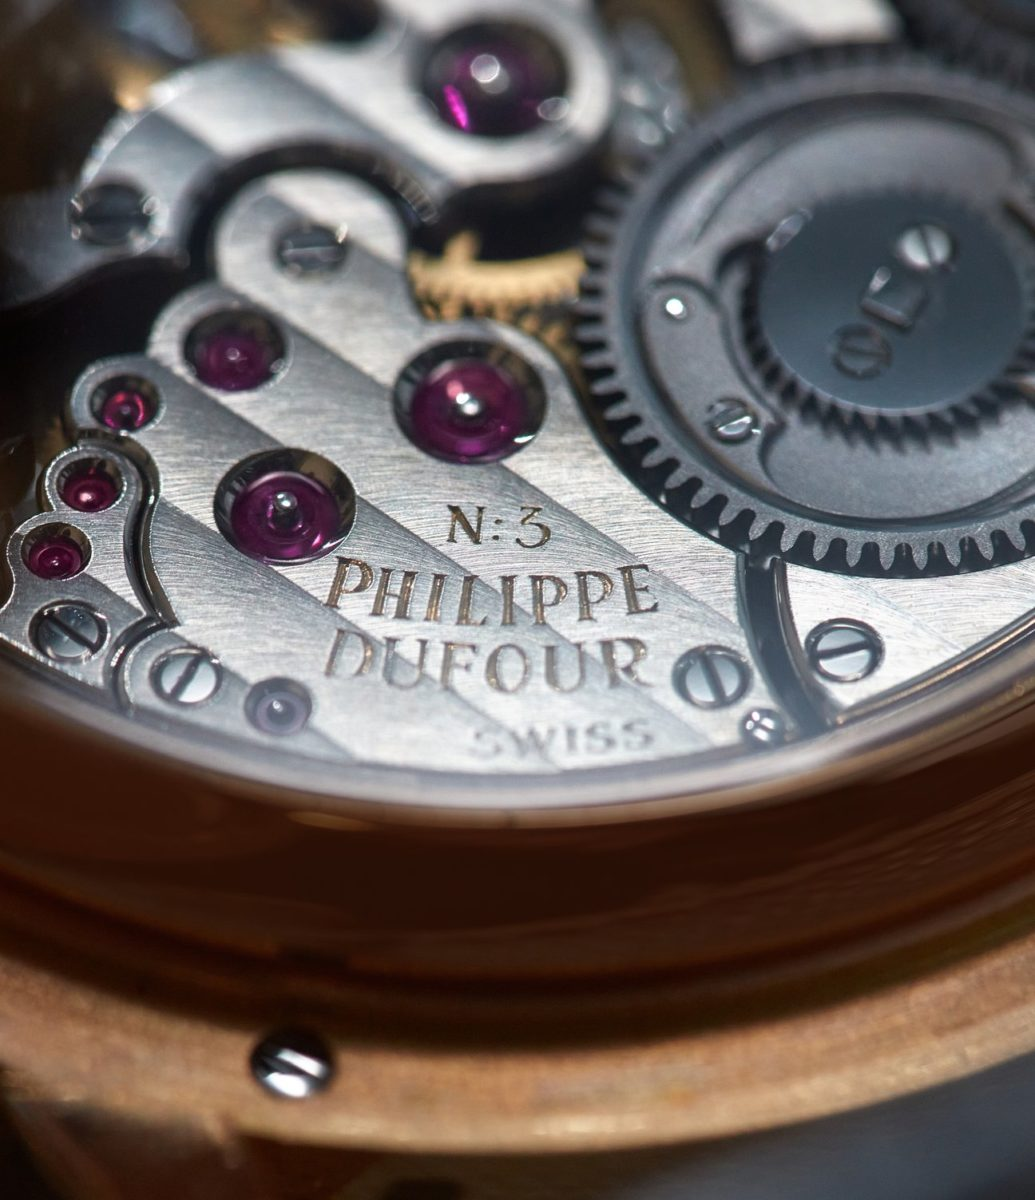 Philippe Dufour record